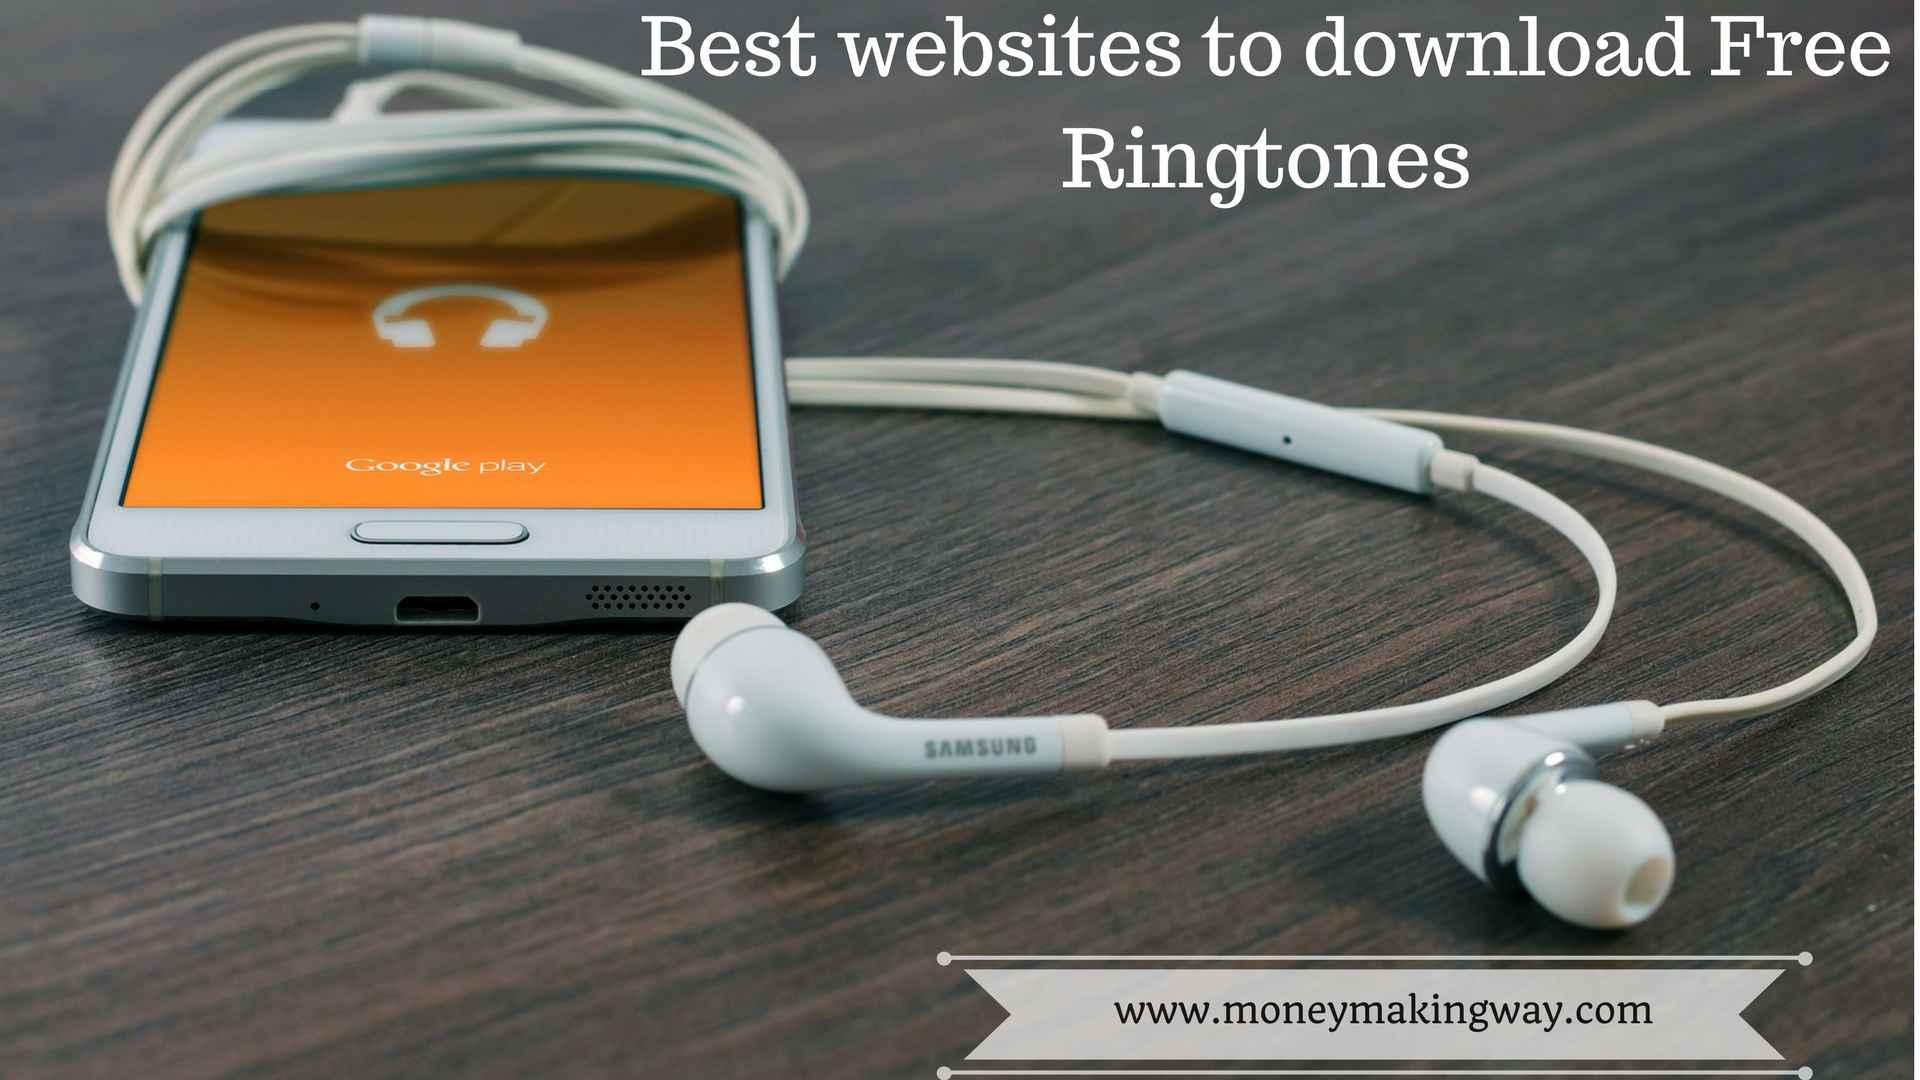 Free Ringtones